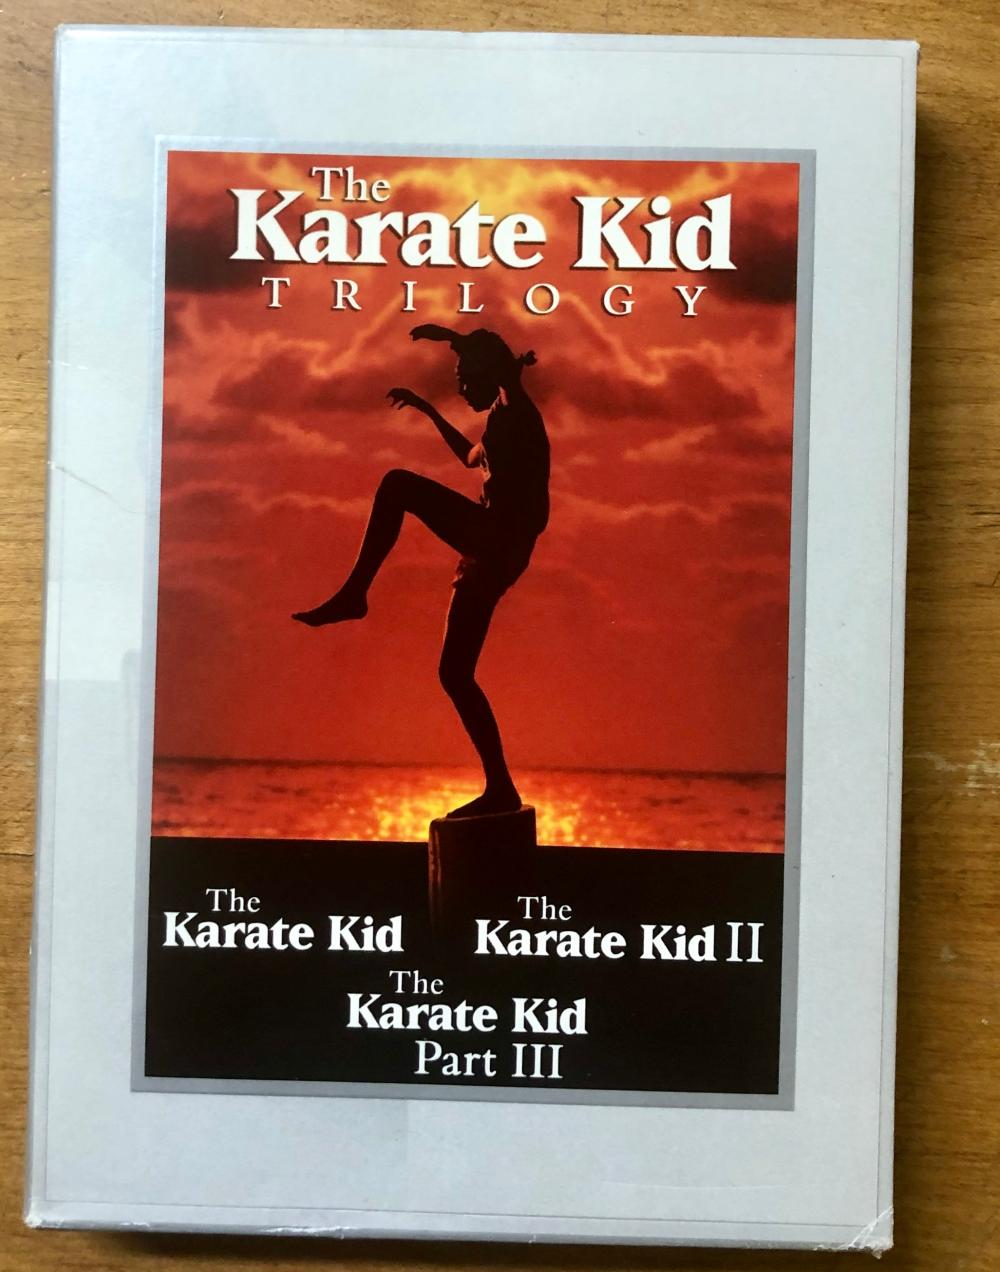 2008 COLUMBIA PICTURES KARATE KID (3) DVD TRILOGY SET